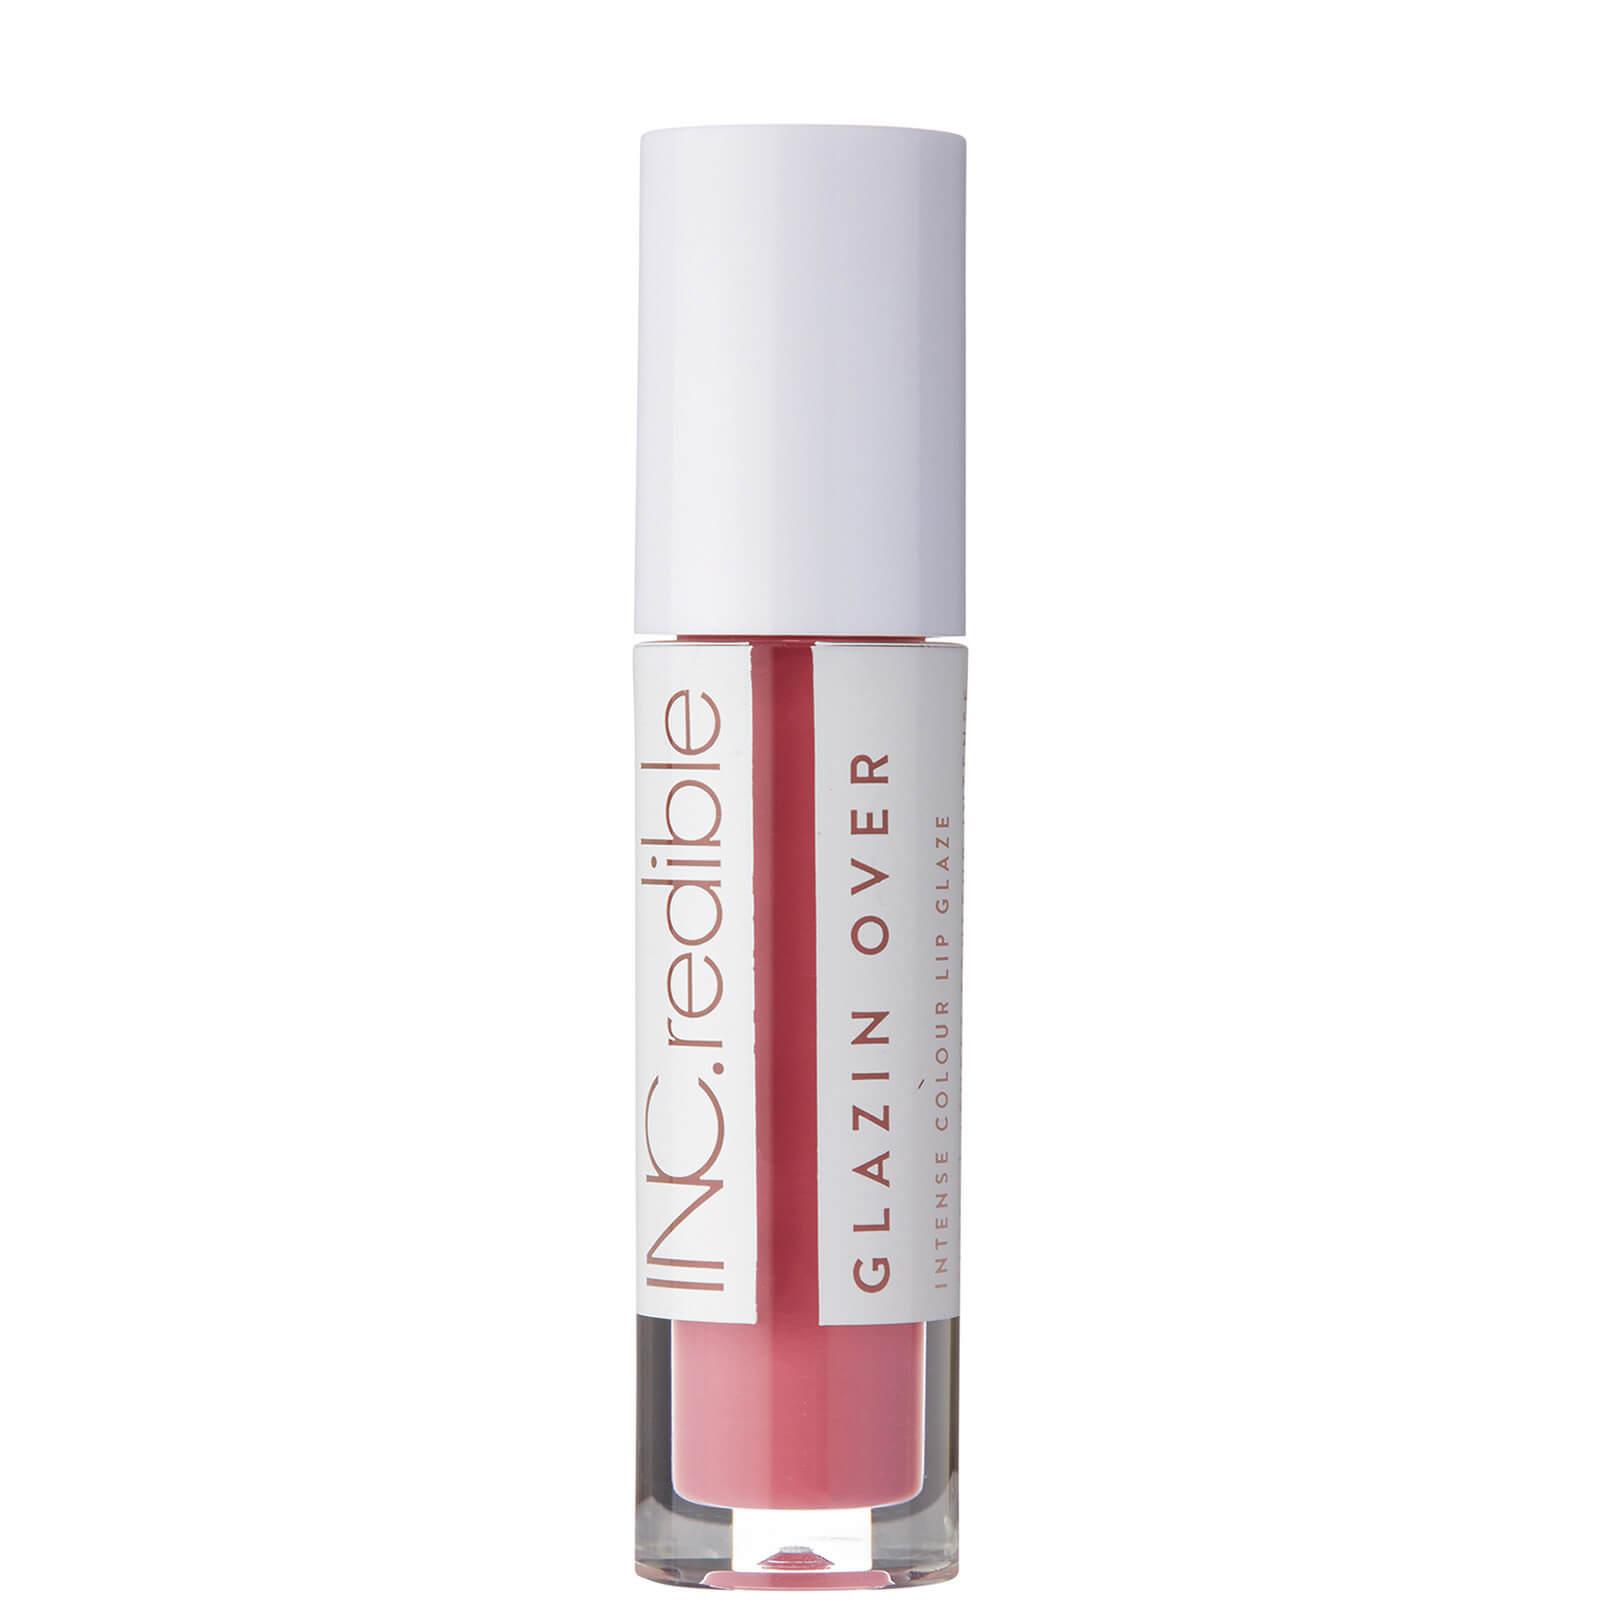 INC.redible Glazin Over gloss labbra (varie tonalità) - Daily Inspo